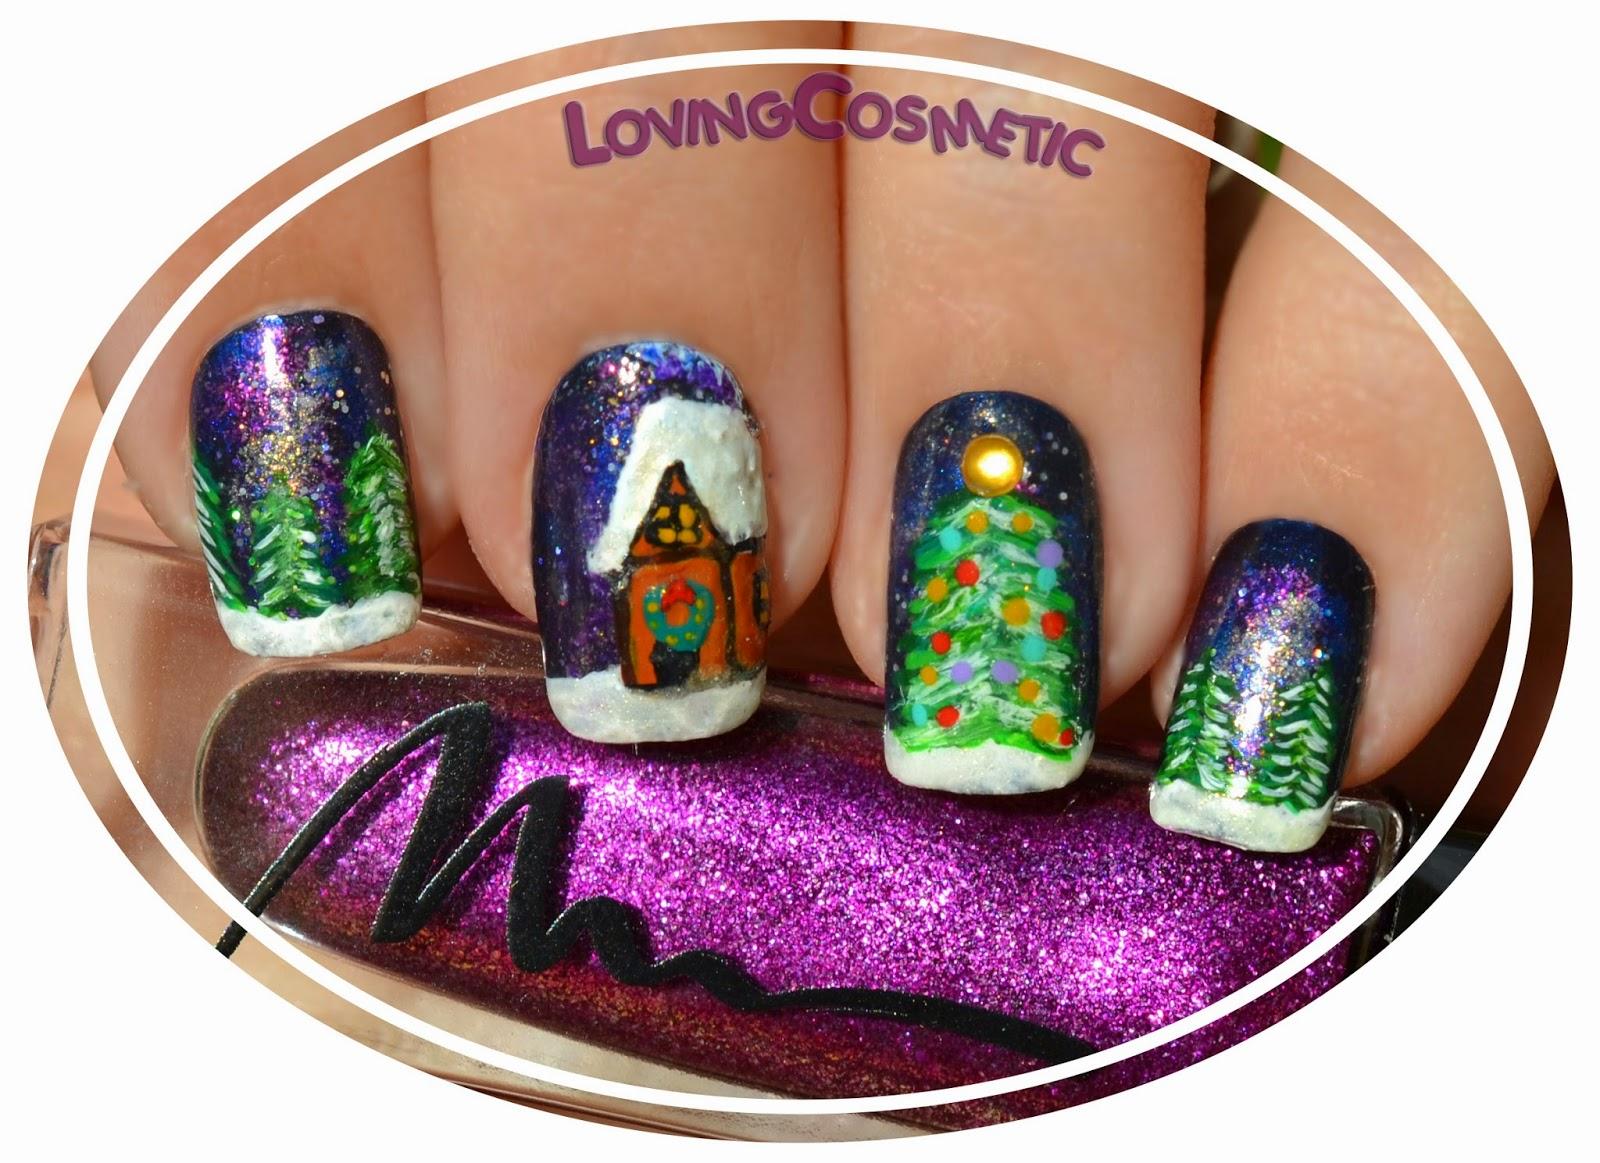 Nail art nails paisaje navideño landscape christmas acrylic acrilicos chanel dior marionnaud